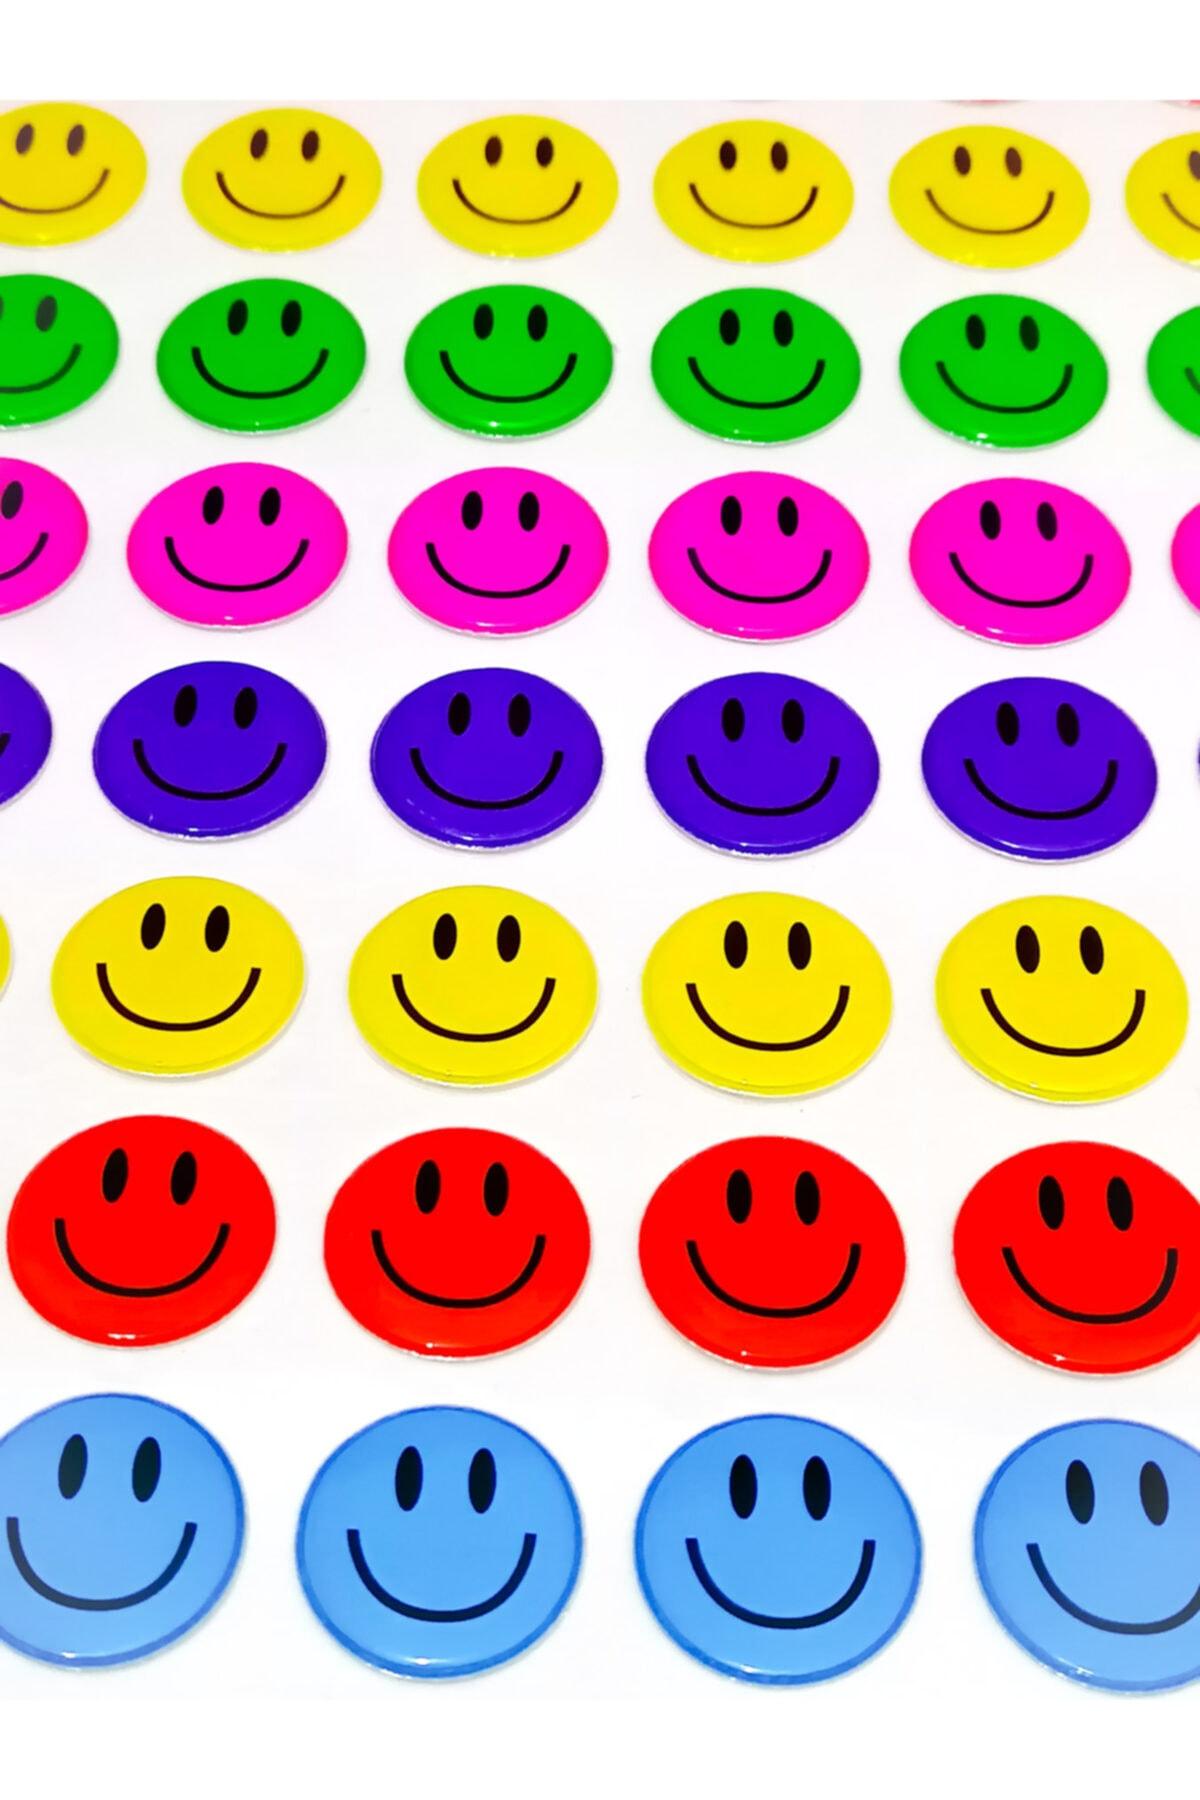 Face Gülen Yüz Emoji Sticker 79 Adet 2 Cm 1